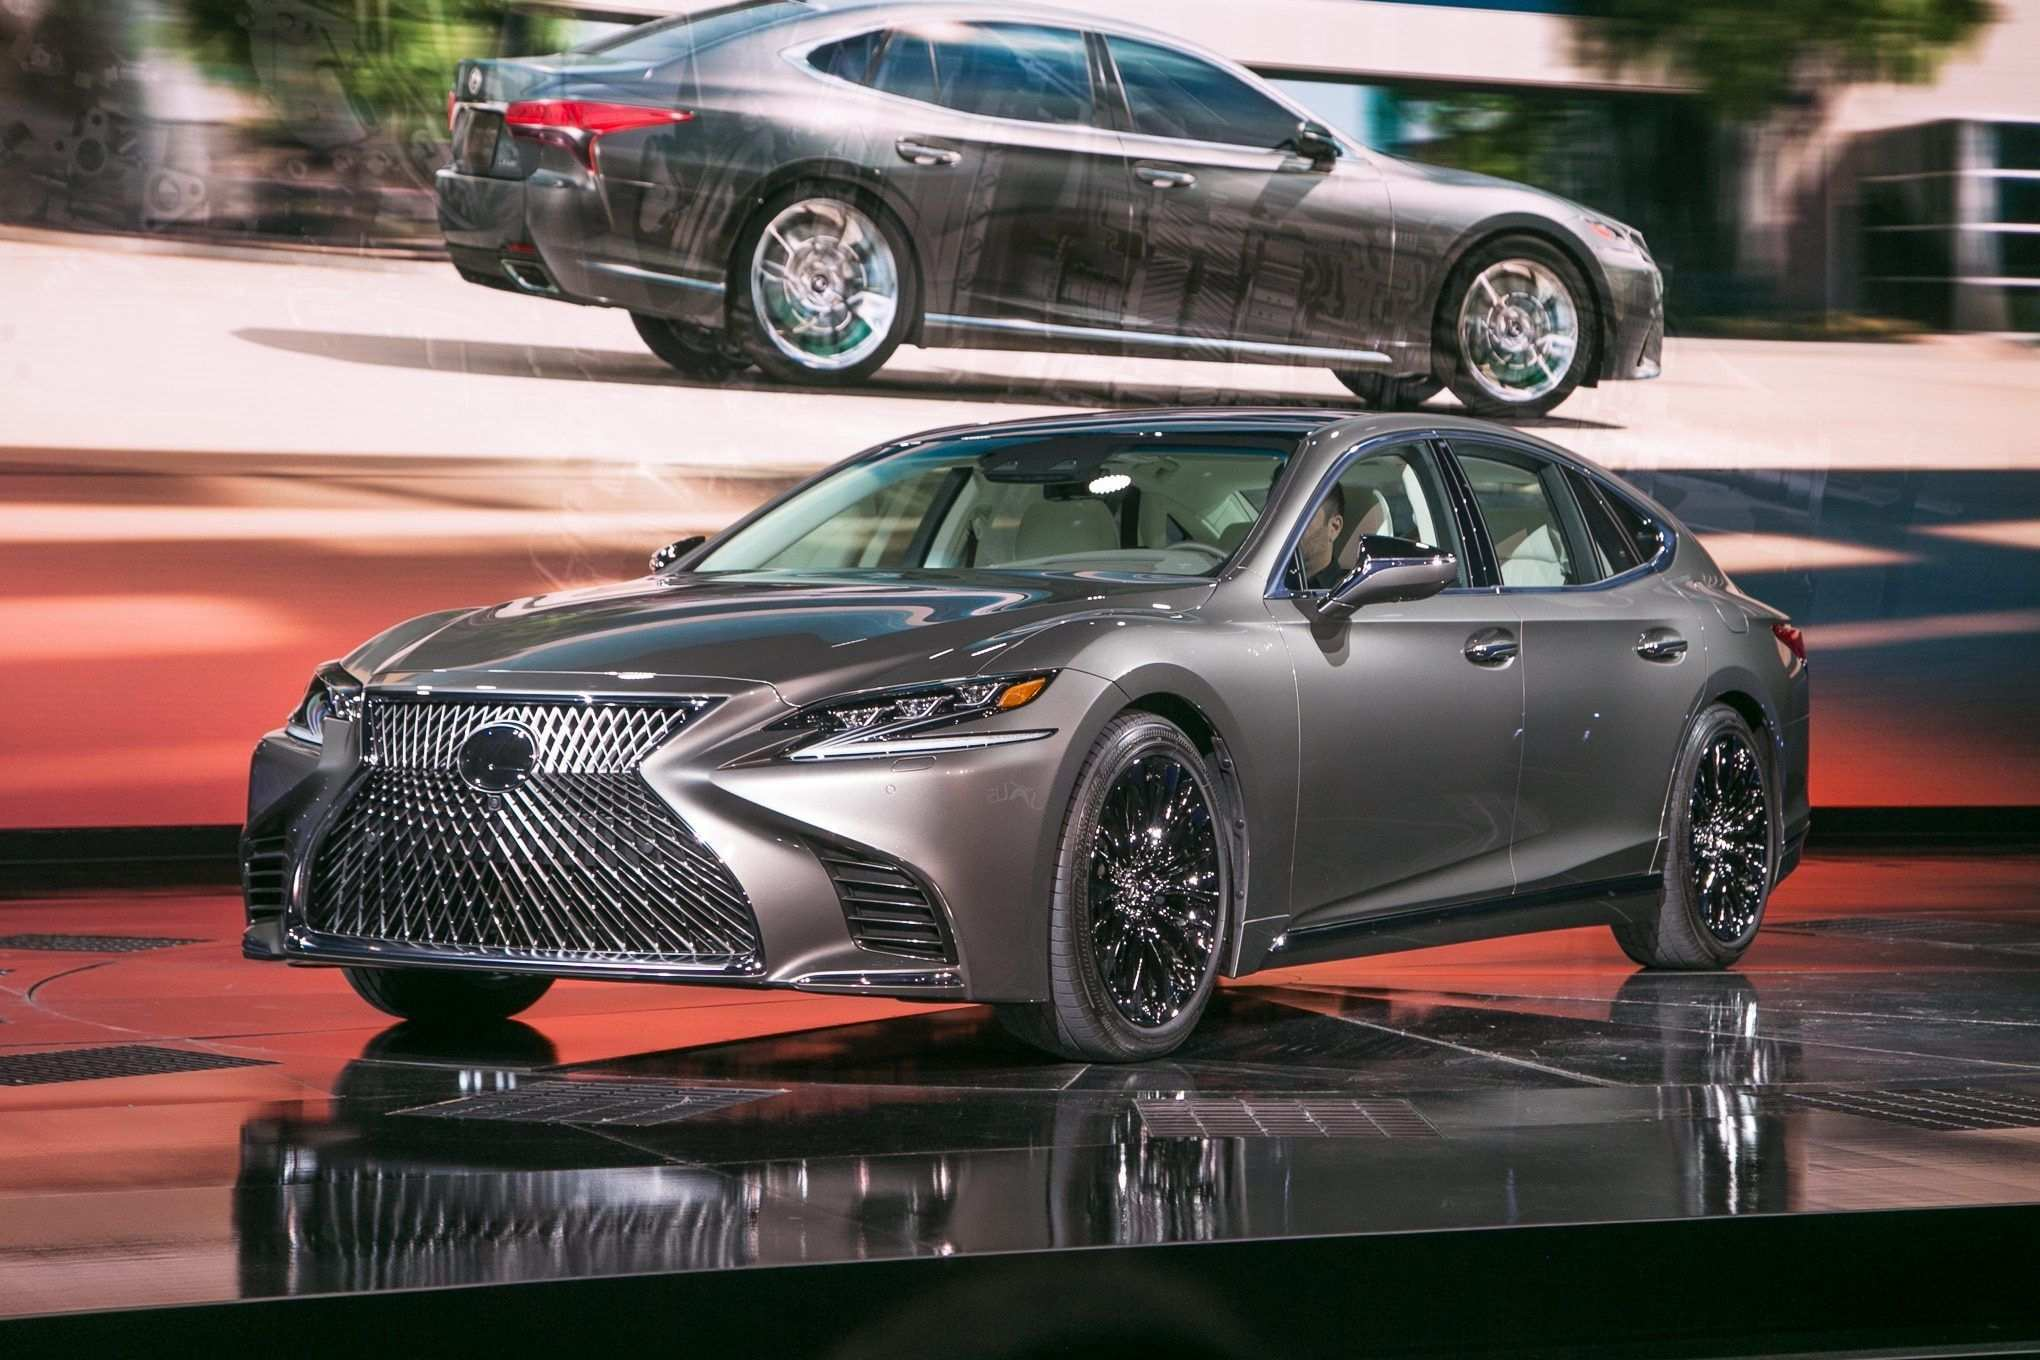 52 Gallery of Lexus Ls 2020 Speed Test by Lexus Ls 2020